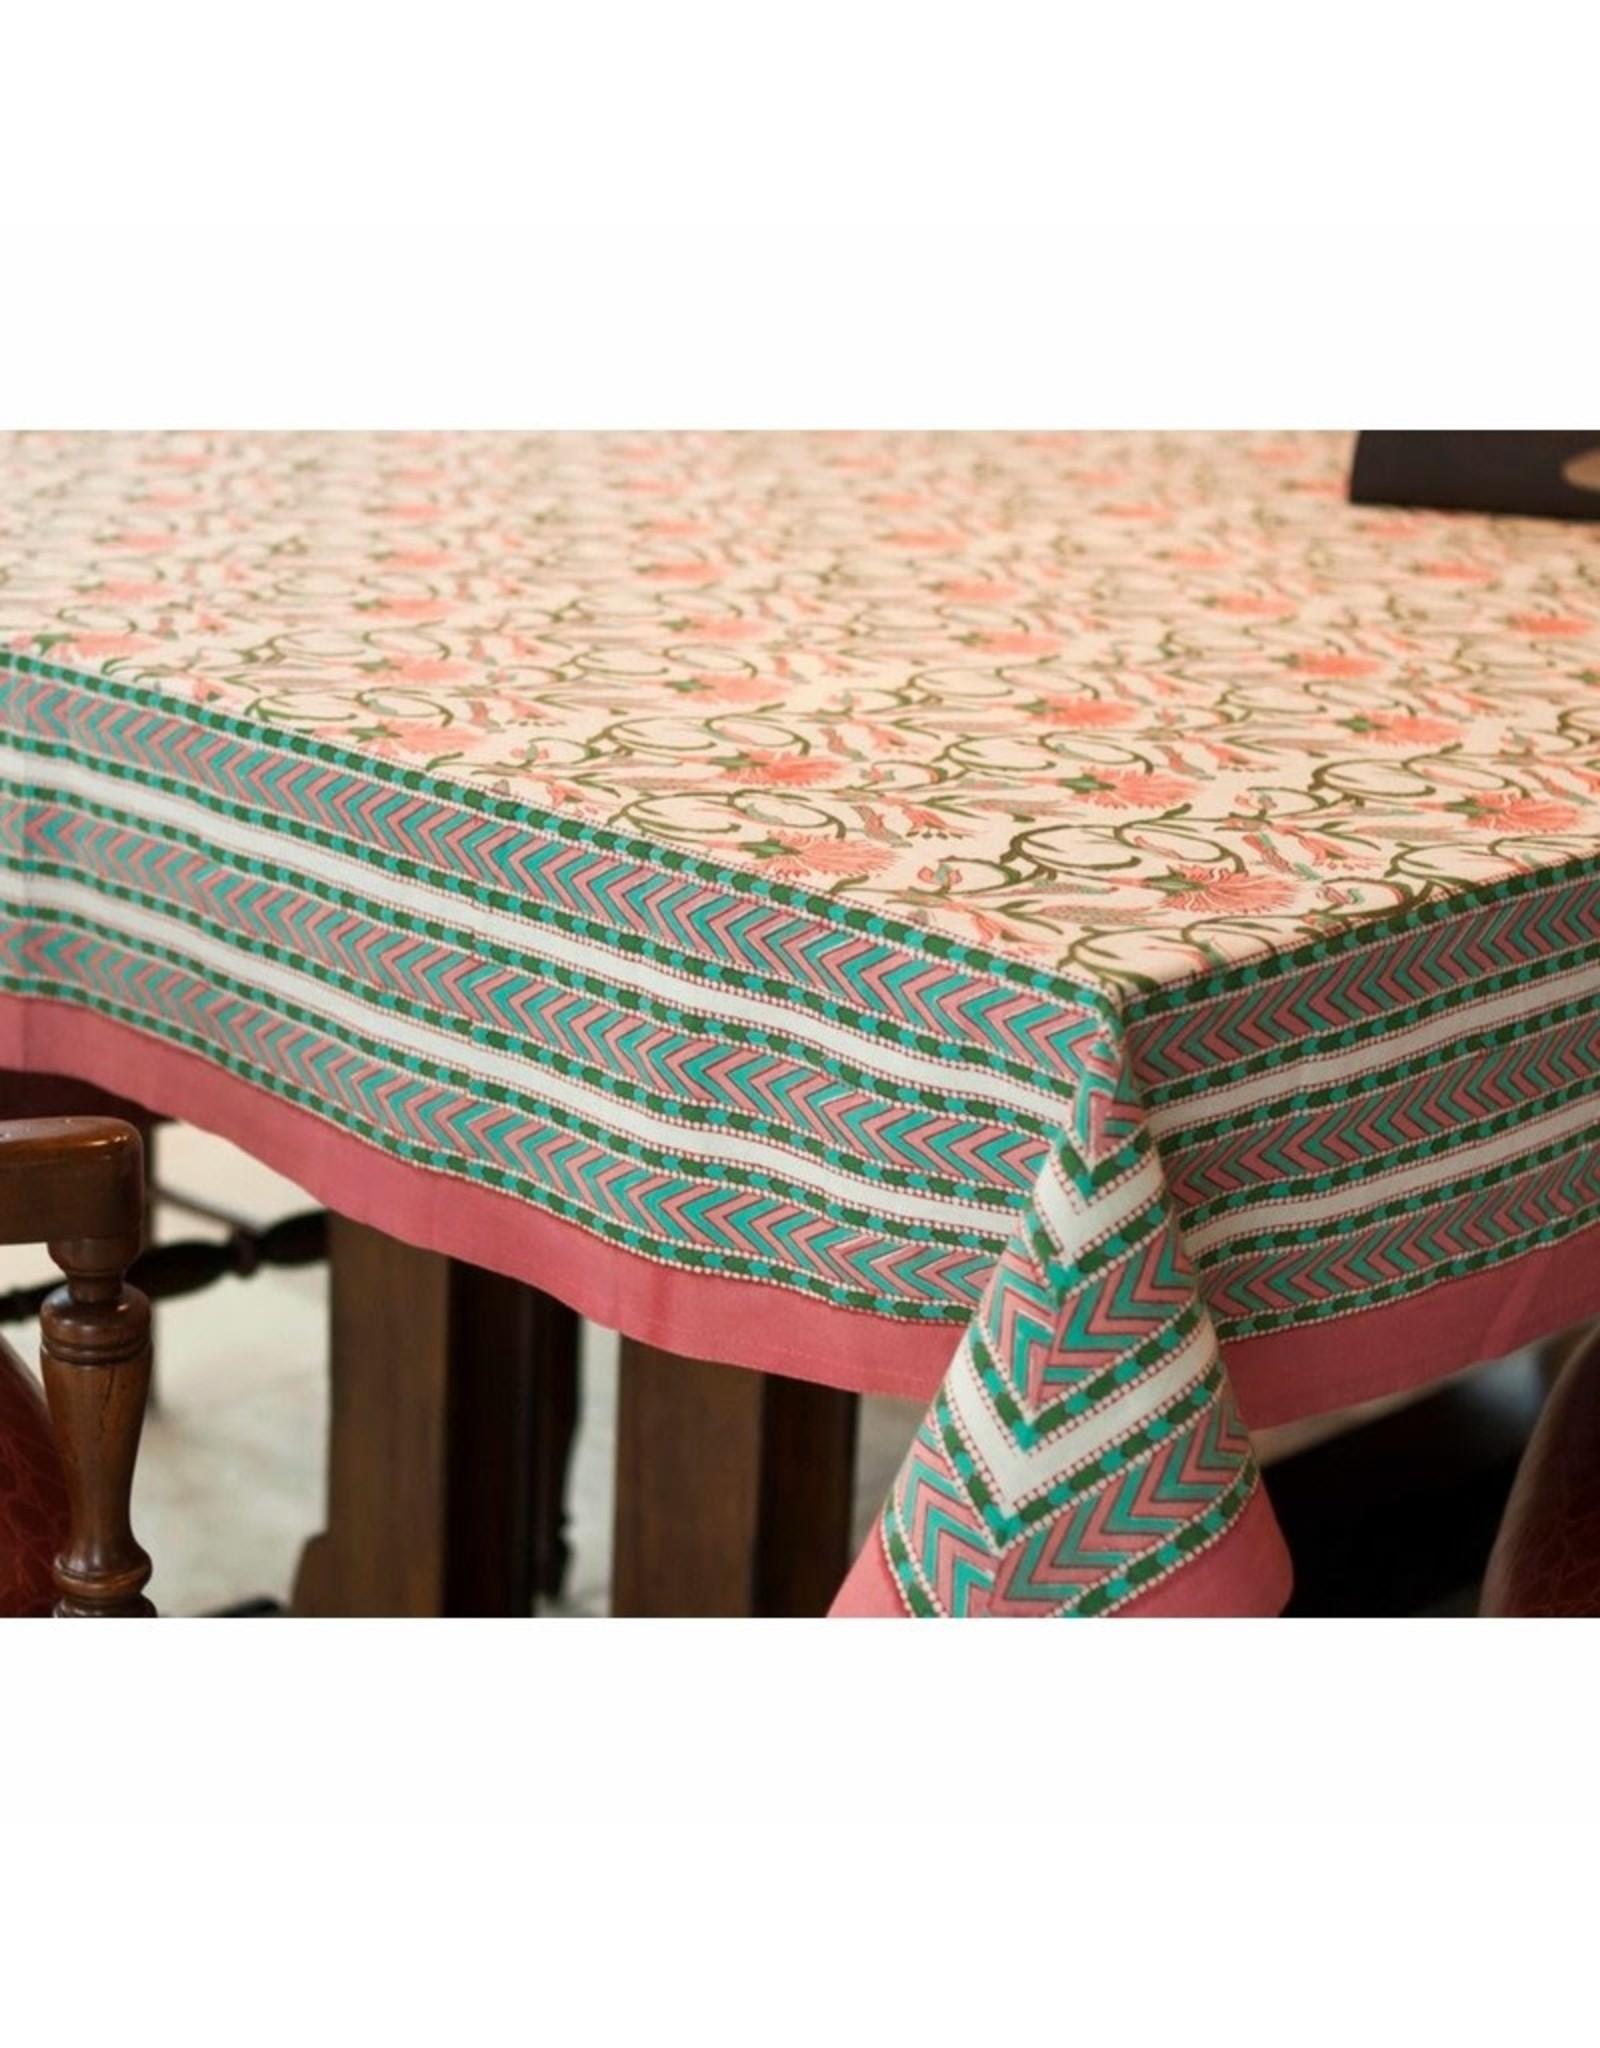 Fair Trade Winds Fantail Paradiso Tablecloth, India.